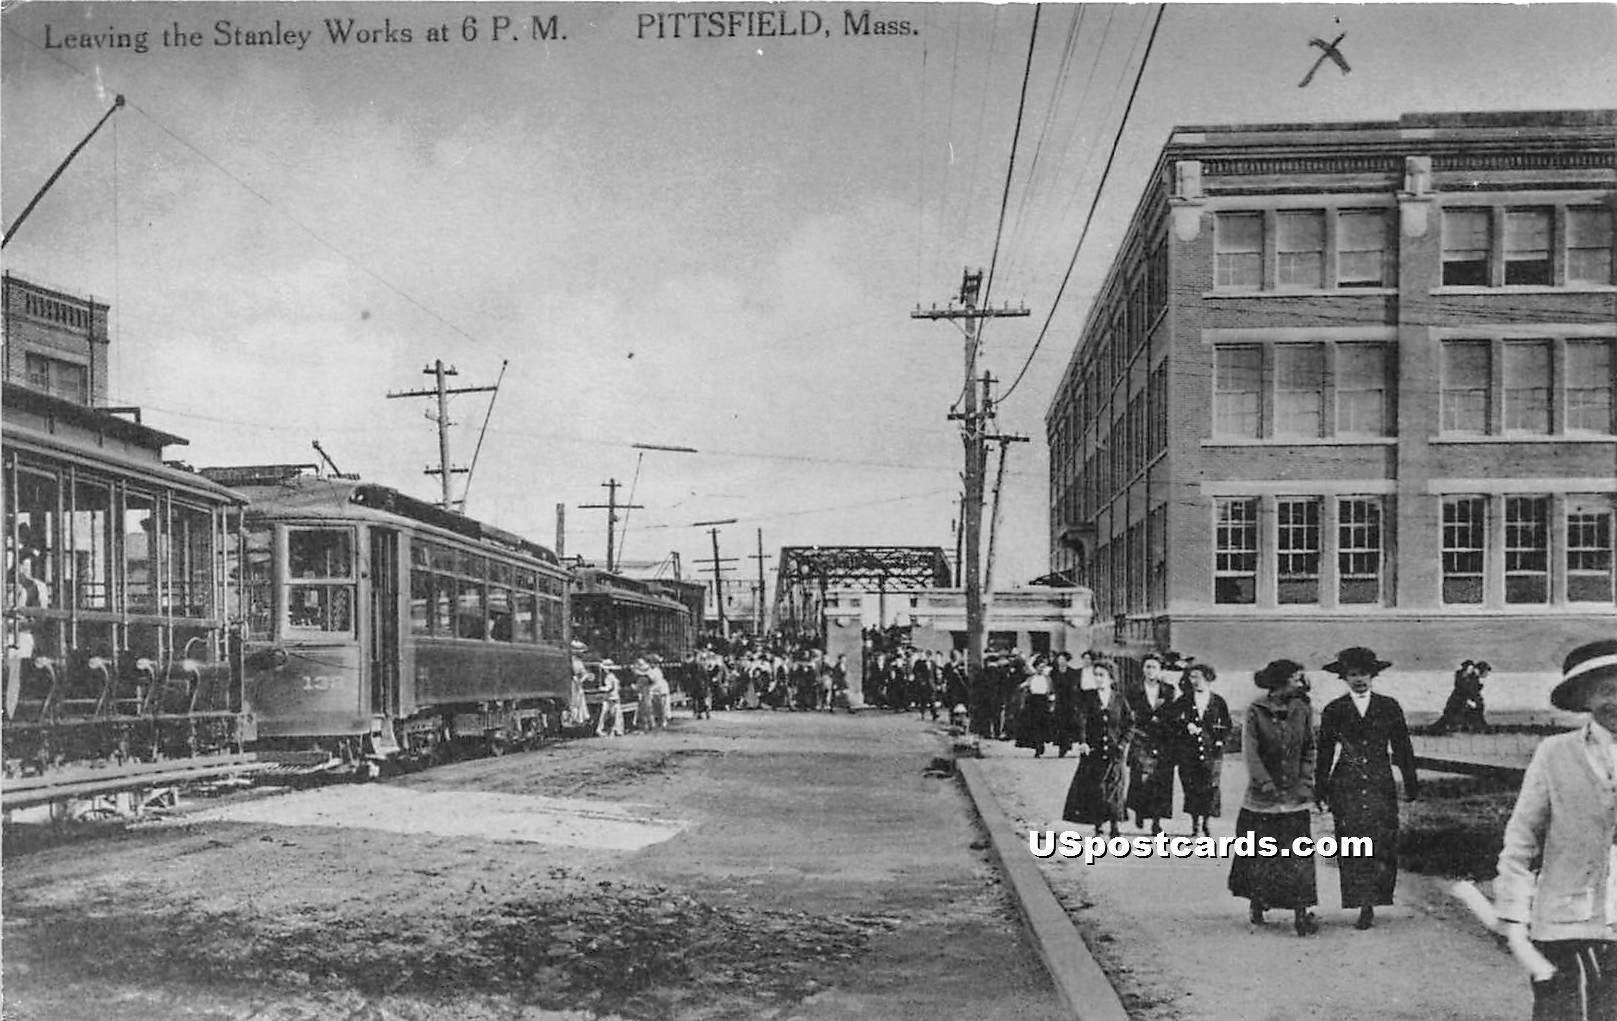 Leaving the Stanley Works - Pittsfield, Massachusetts MA Postcard